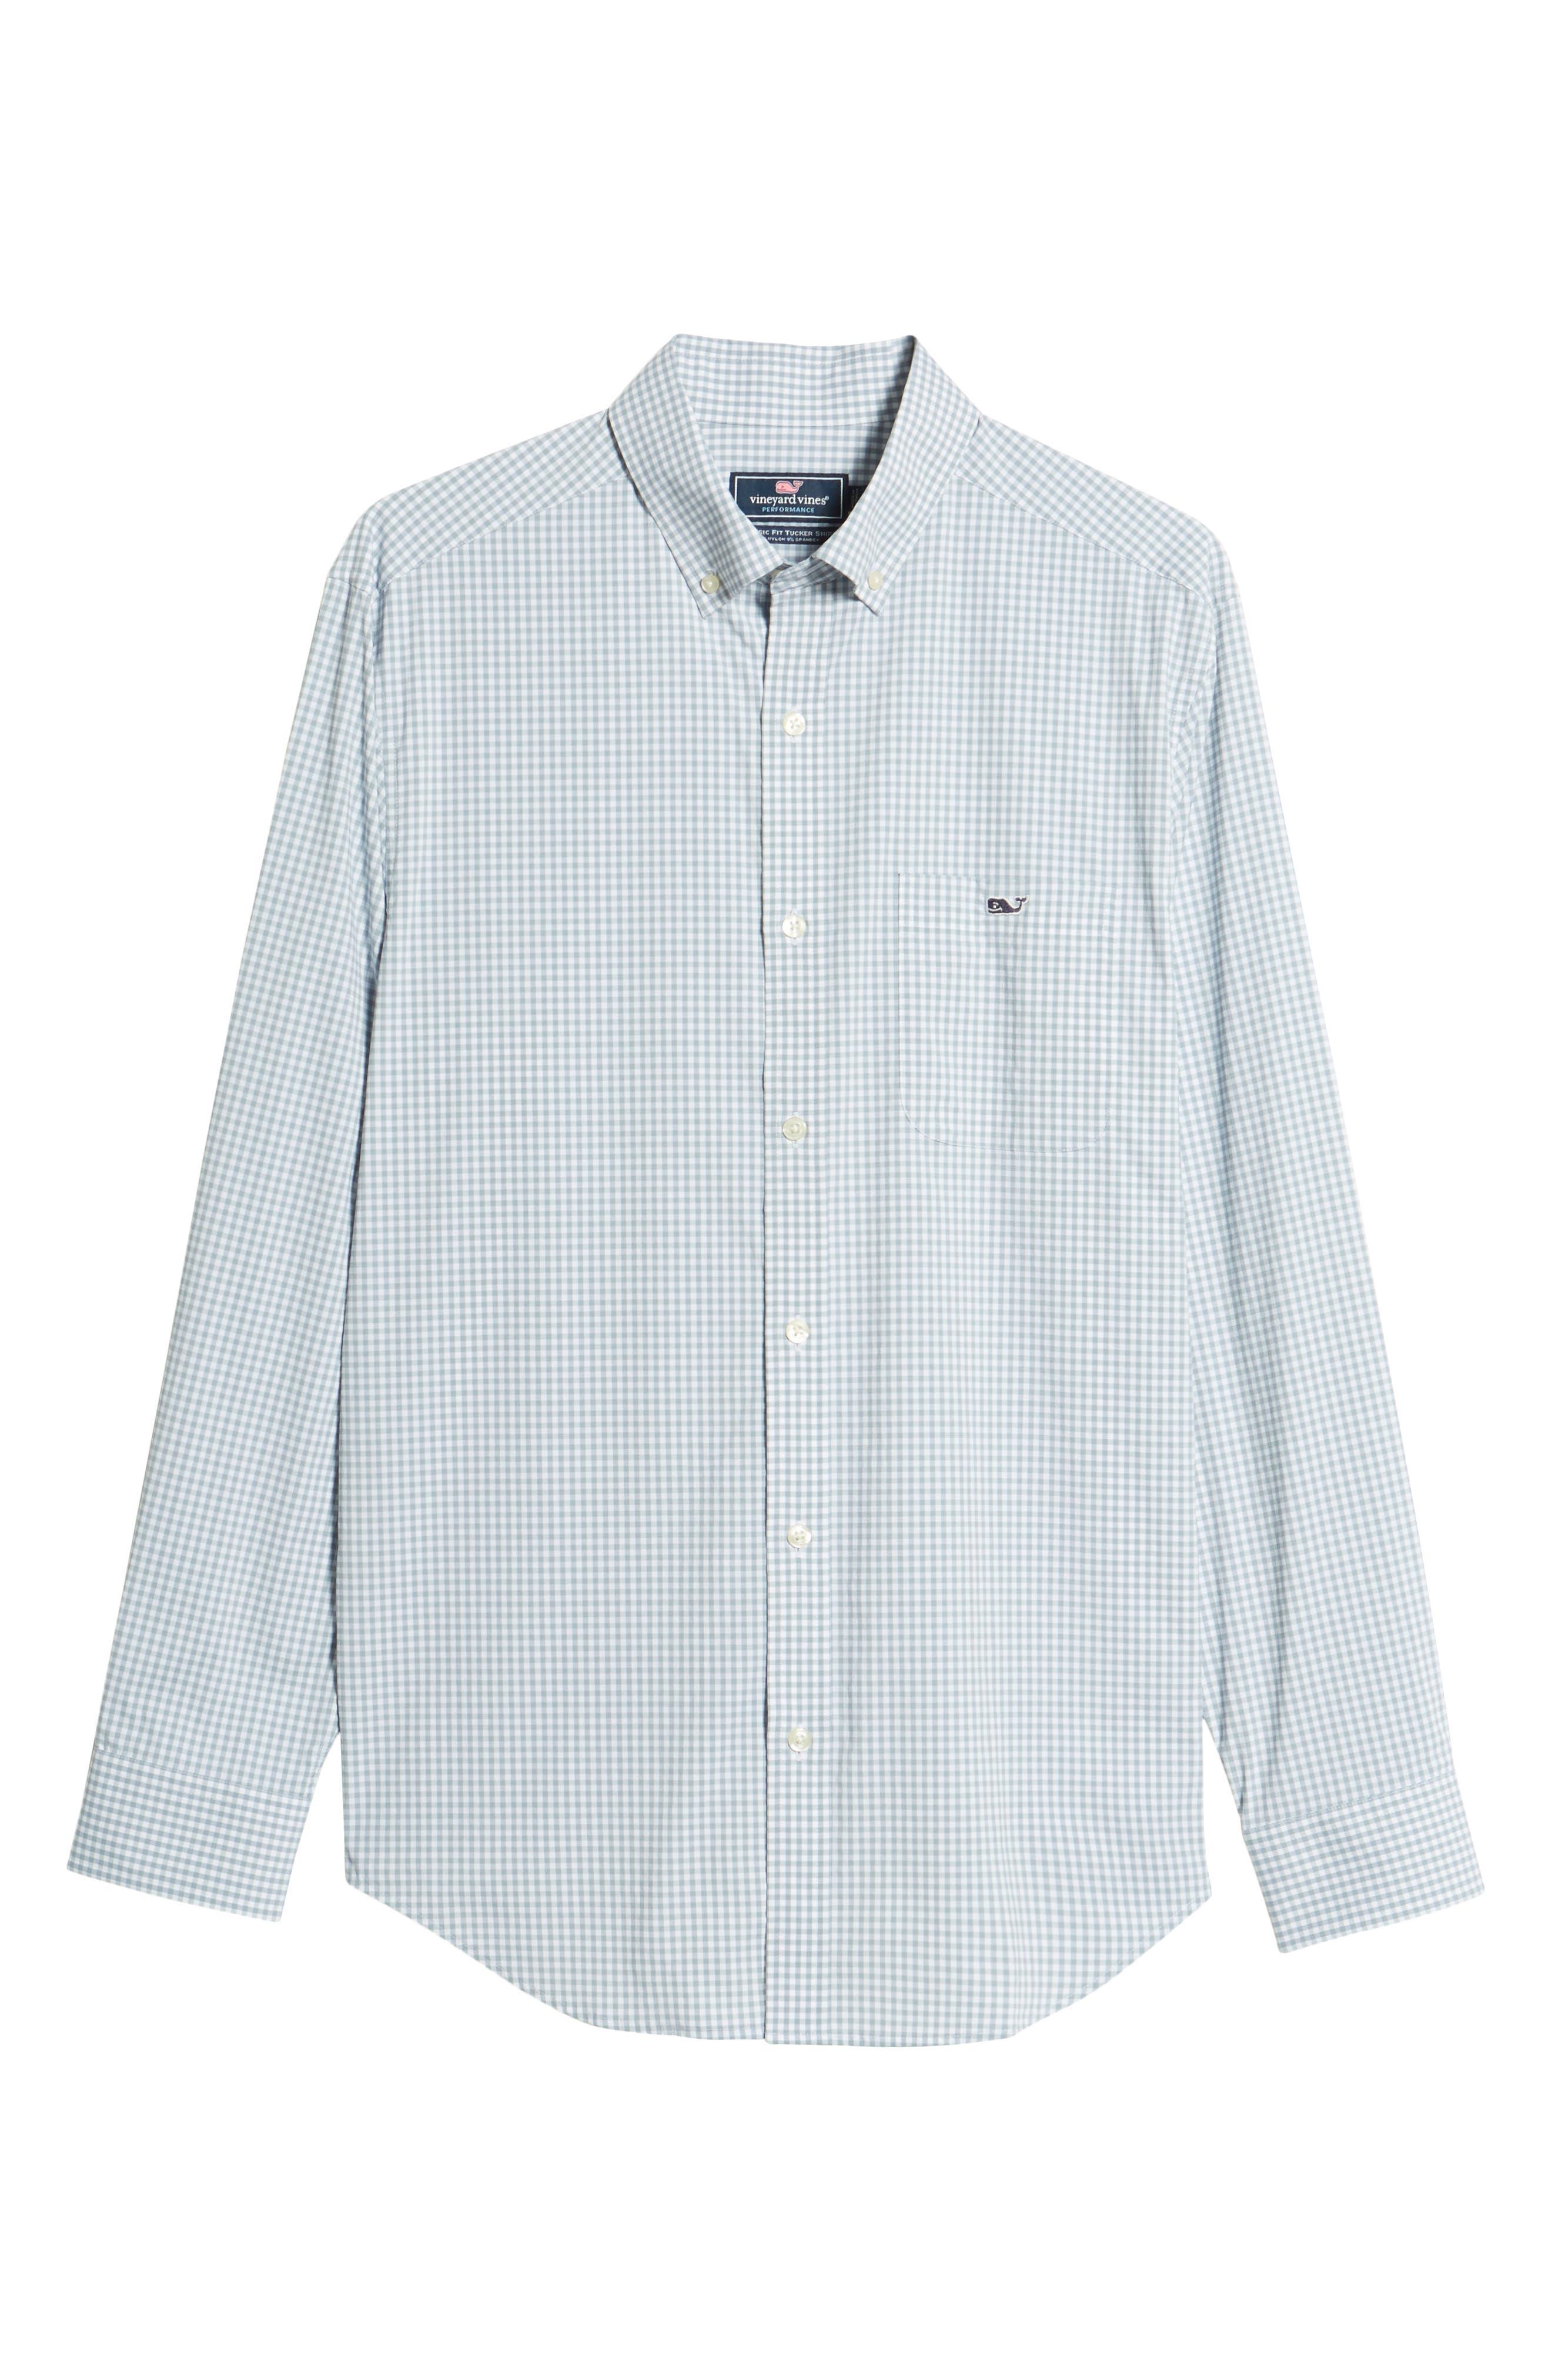 VINEYARD VINES,                             Grand Cay Tucker Regular Fit Gingham Performance Sport Shirt,                             Alternate thumbnail 6, color,                             023